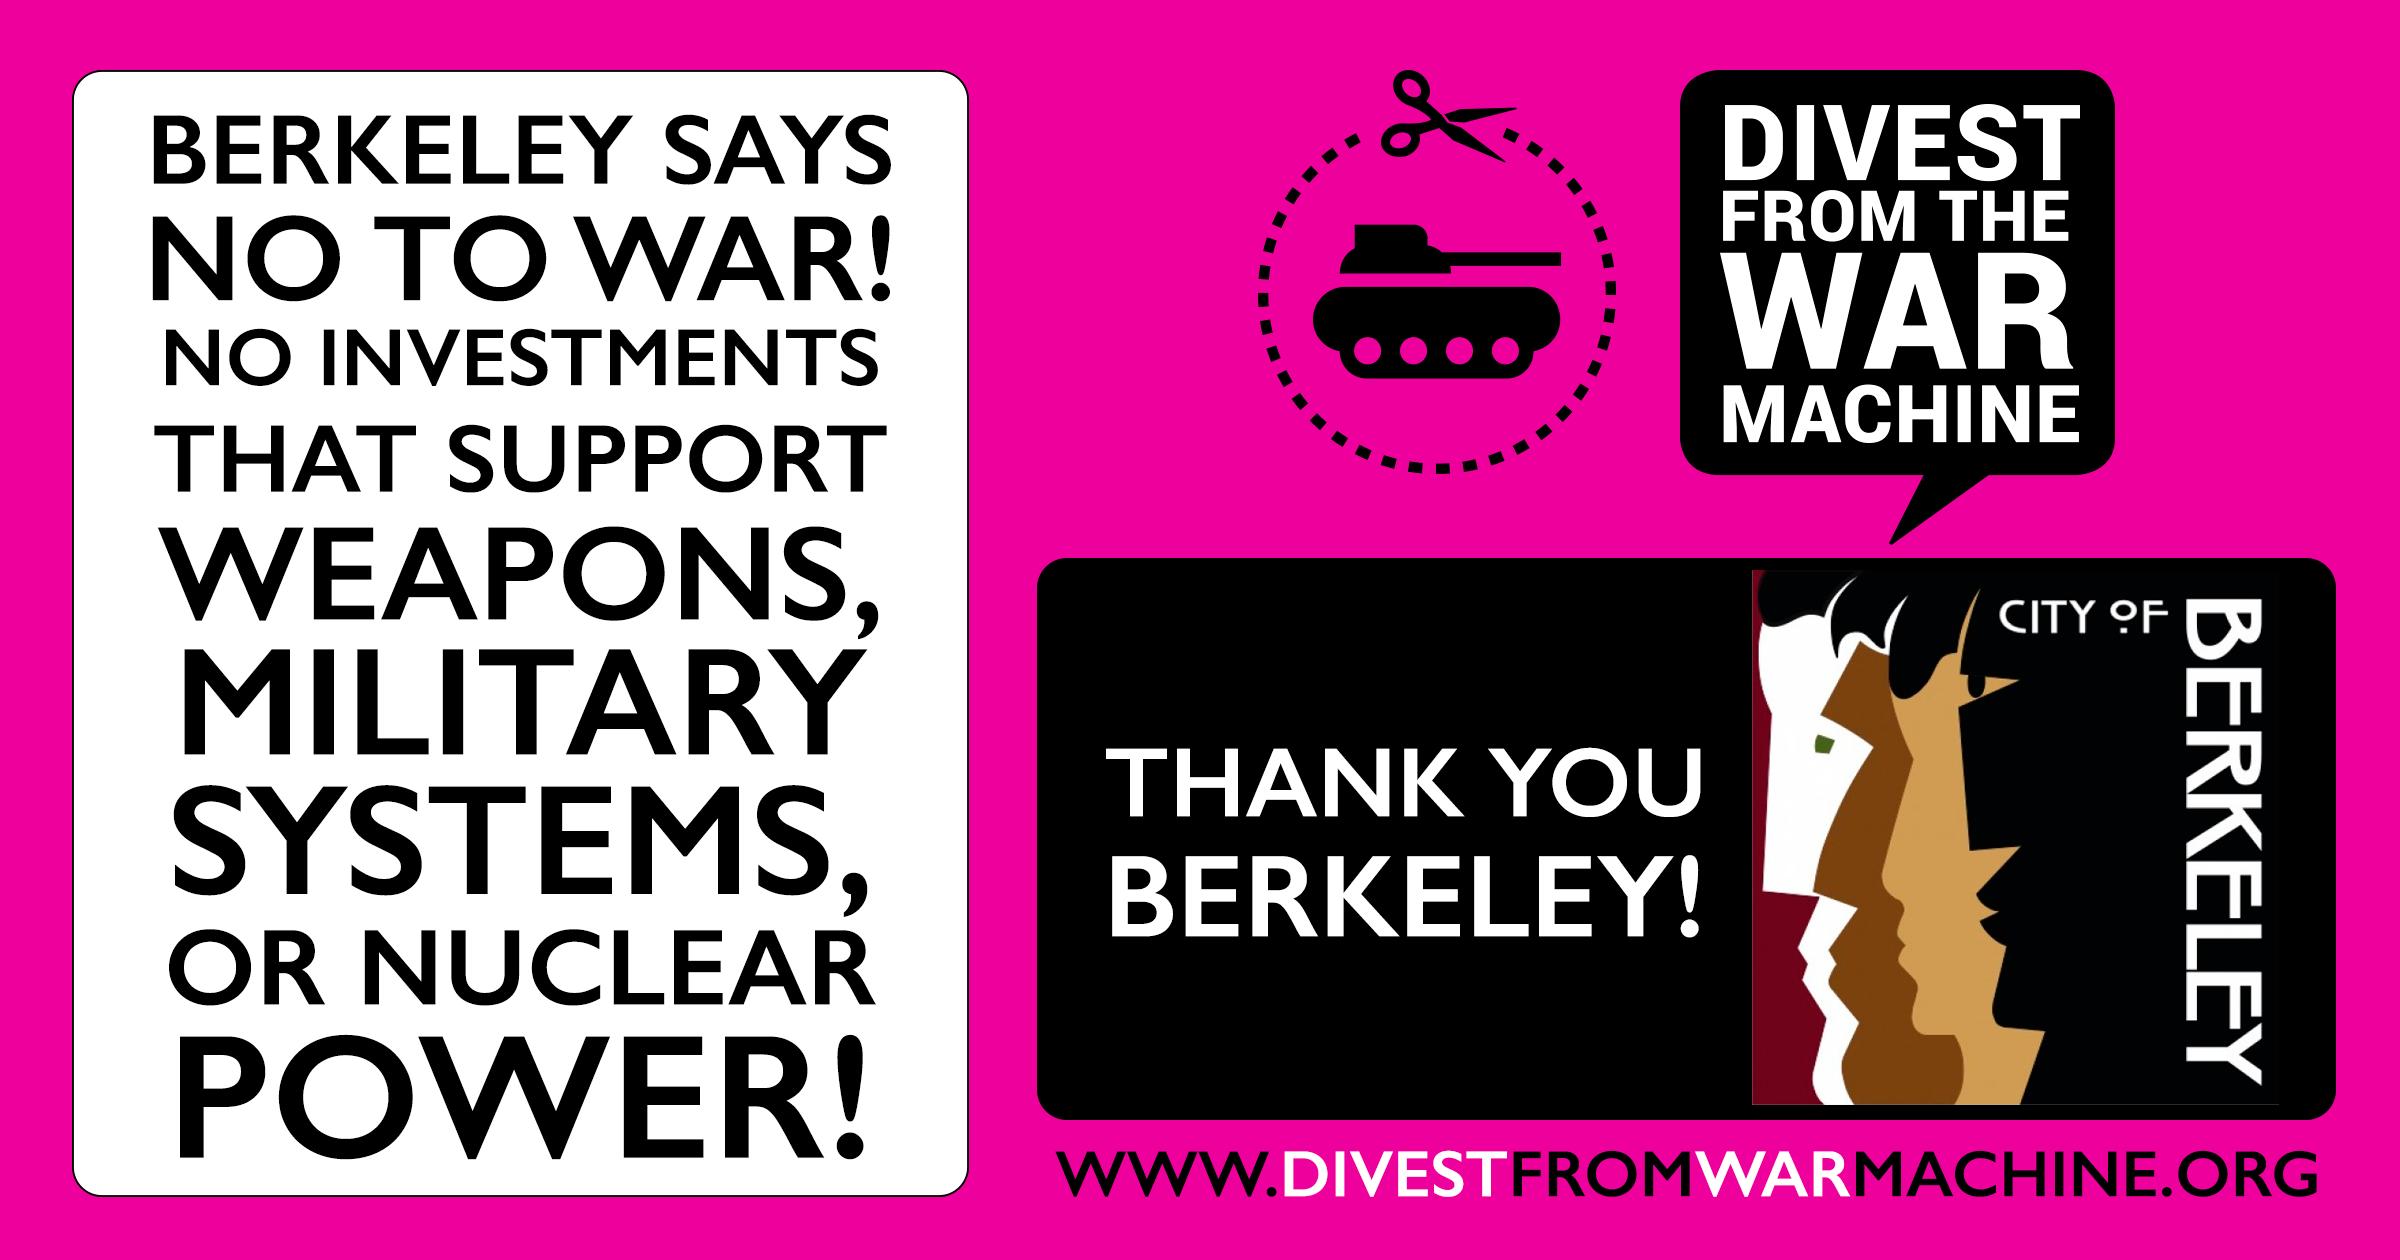 Divest_Victory_Berkeley.png